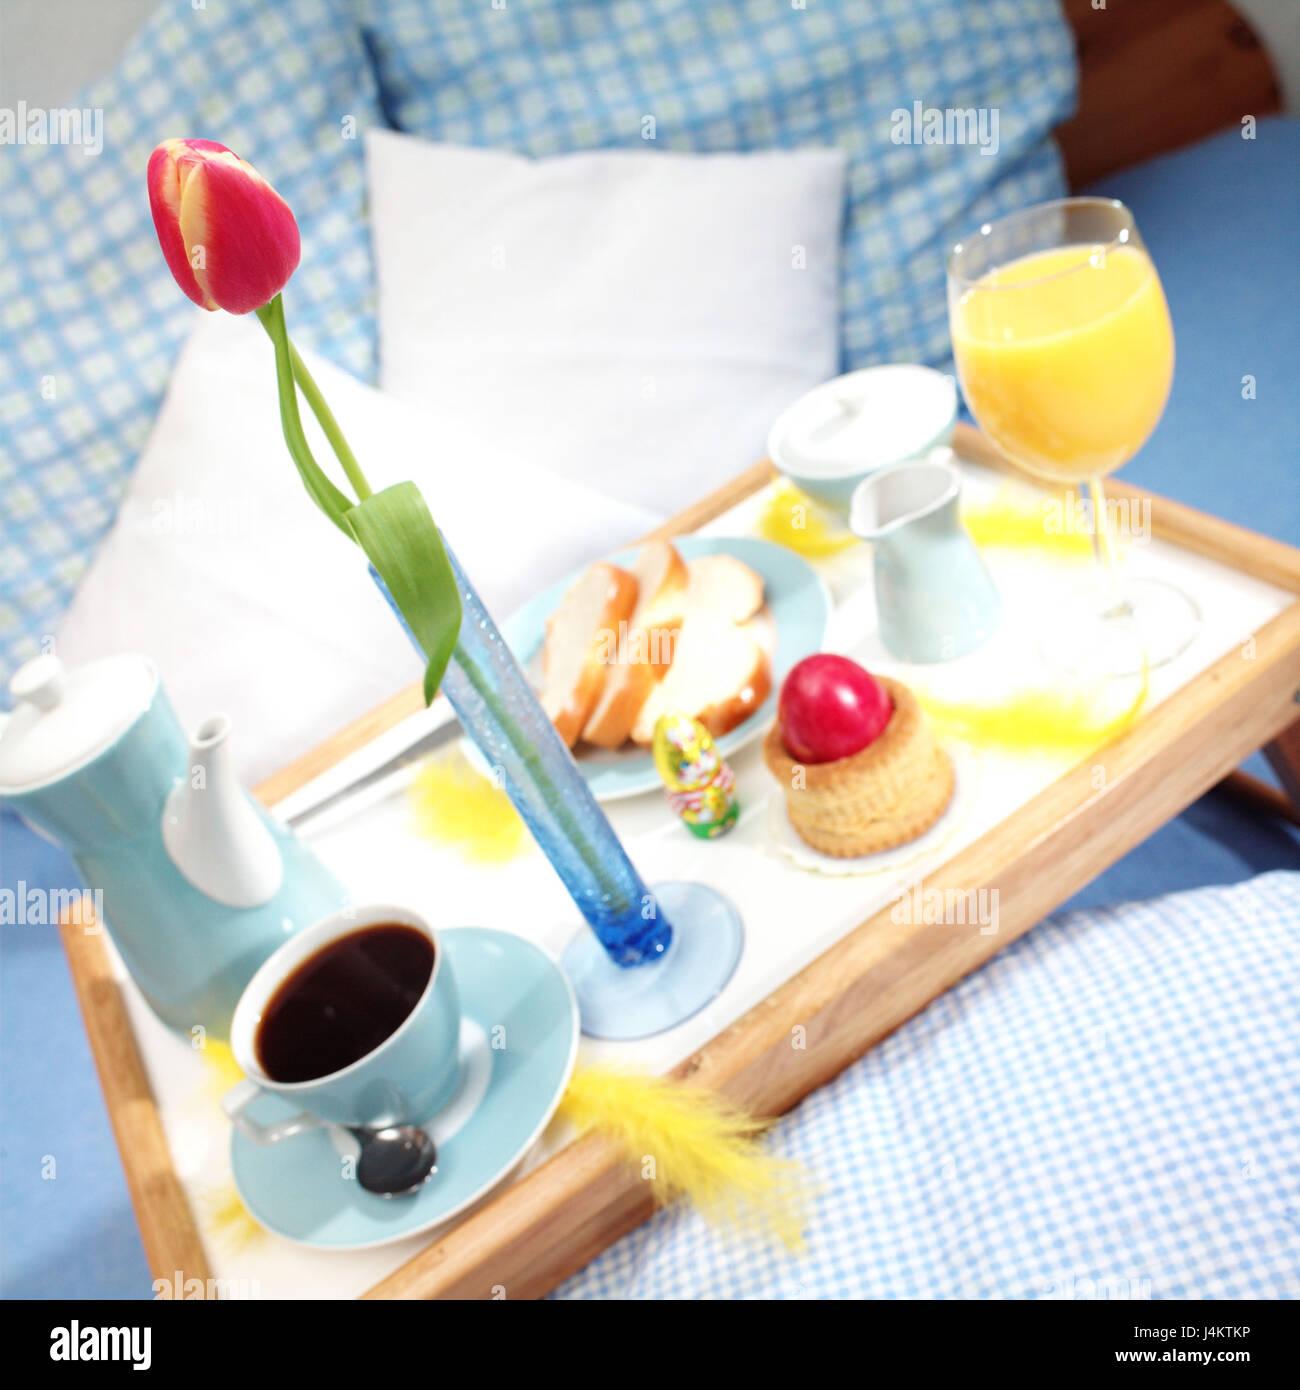 Easter, Bed, Tablet, Easter Breakfast Easter Feast, Easter Decoration,  österlich, Bedroom, U0027food Near The Bedu0027, Has Breakfast, Spoils Breakfast,  Coffee, ...